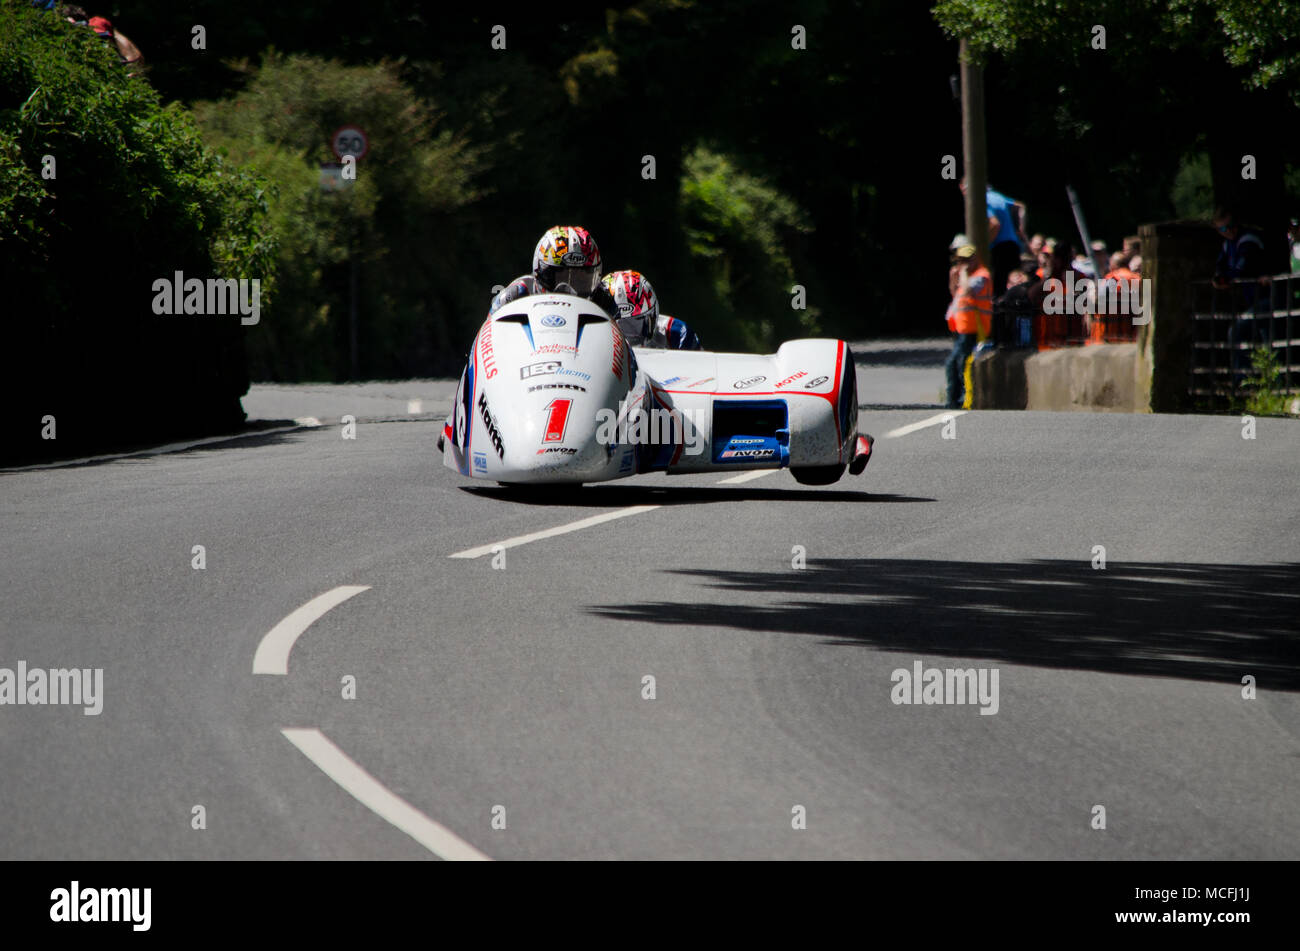 Birchall Brothers Isle of Man TT 2017 Stock Photo